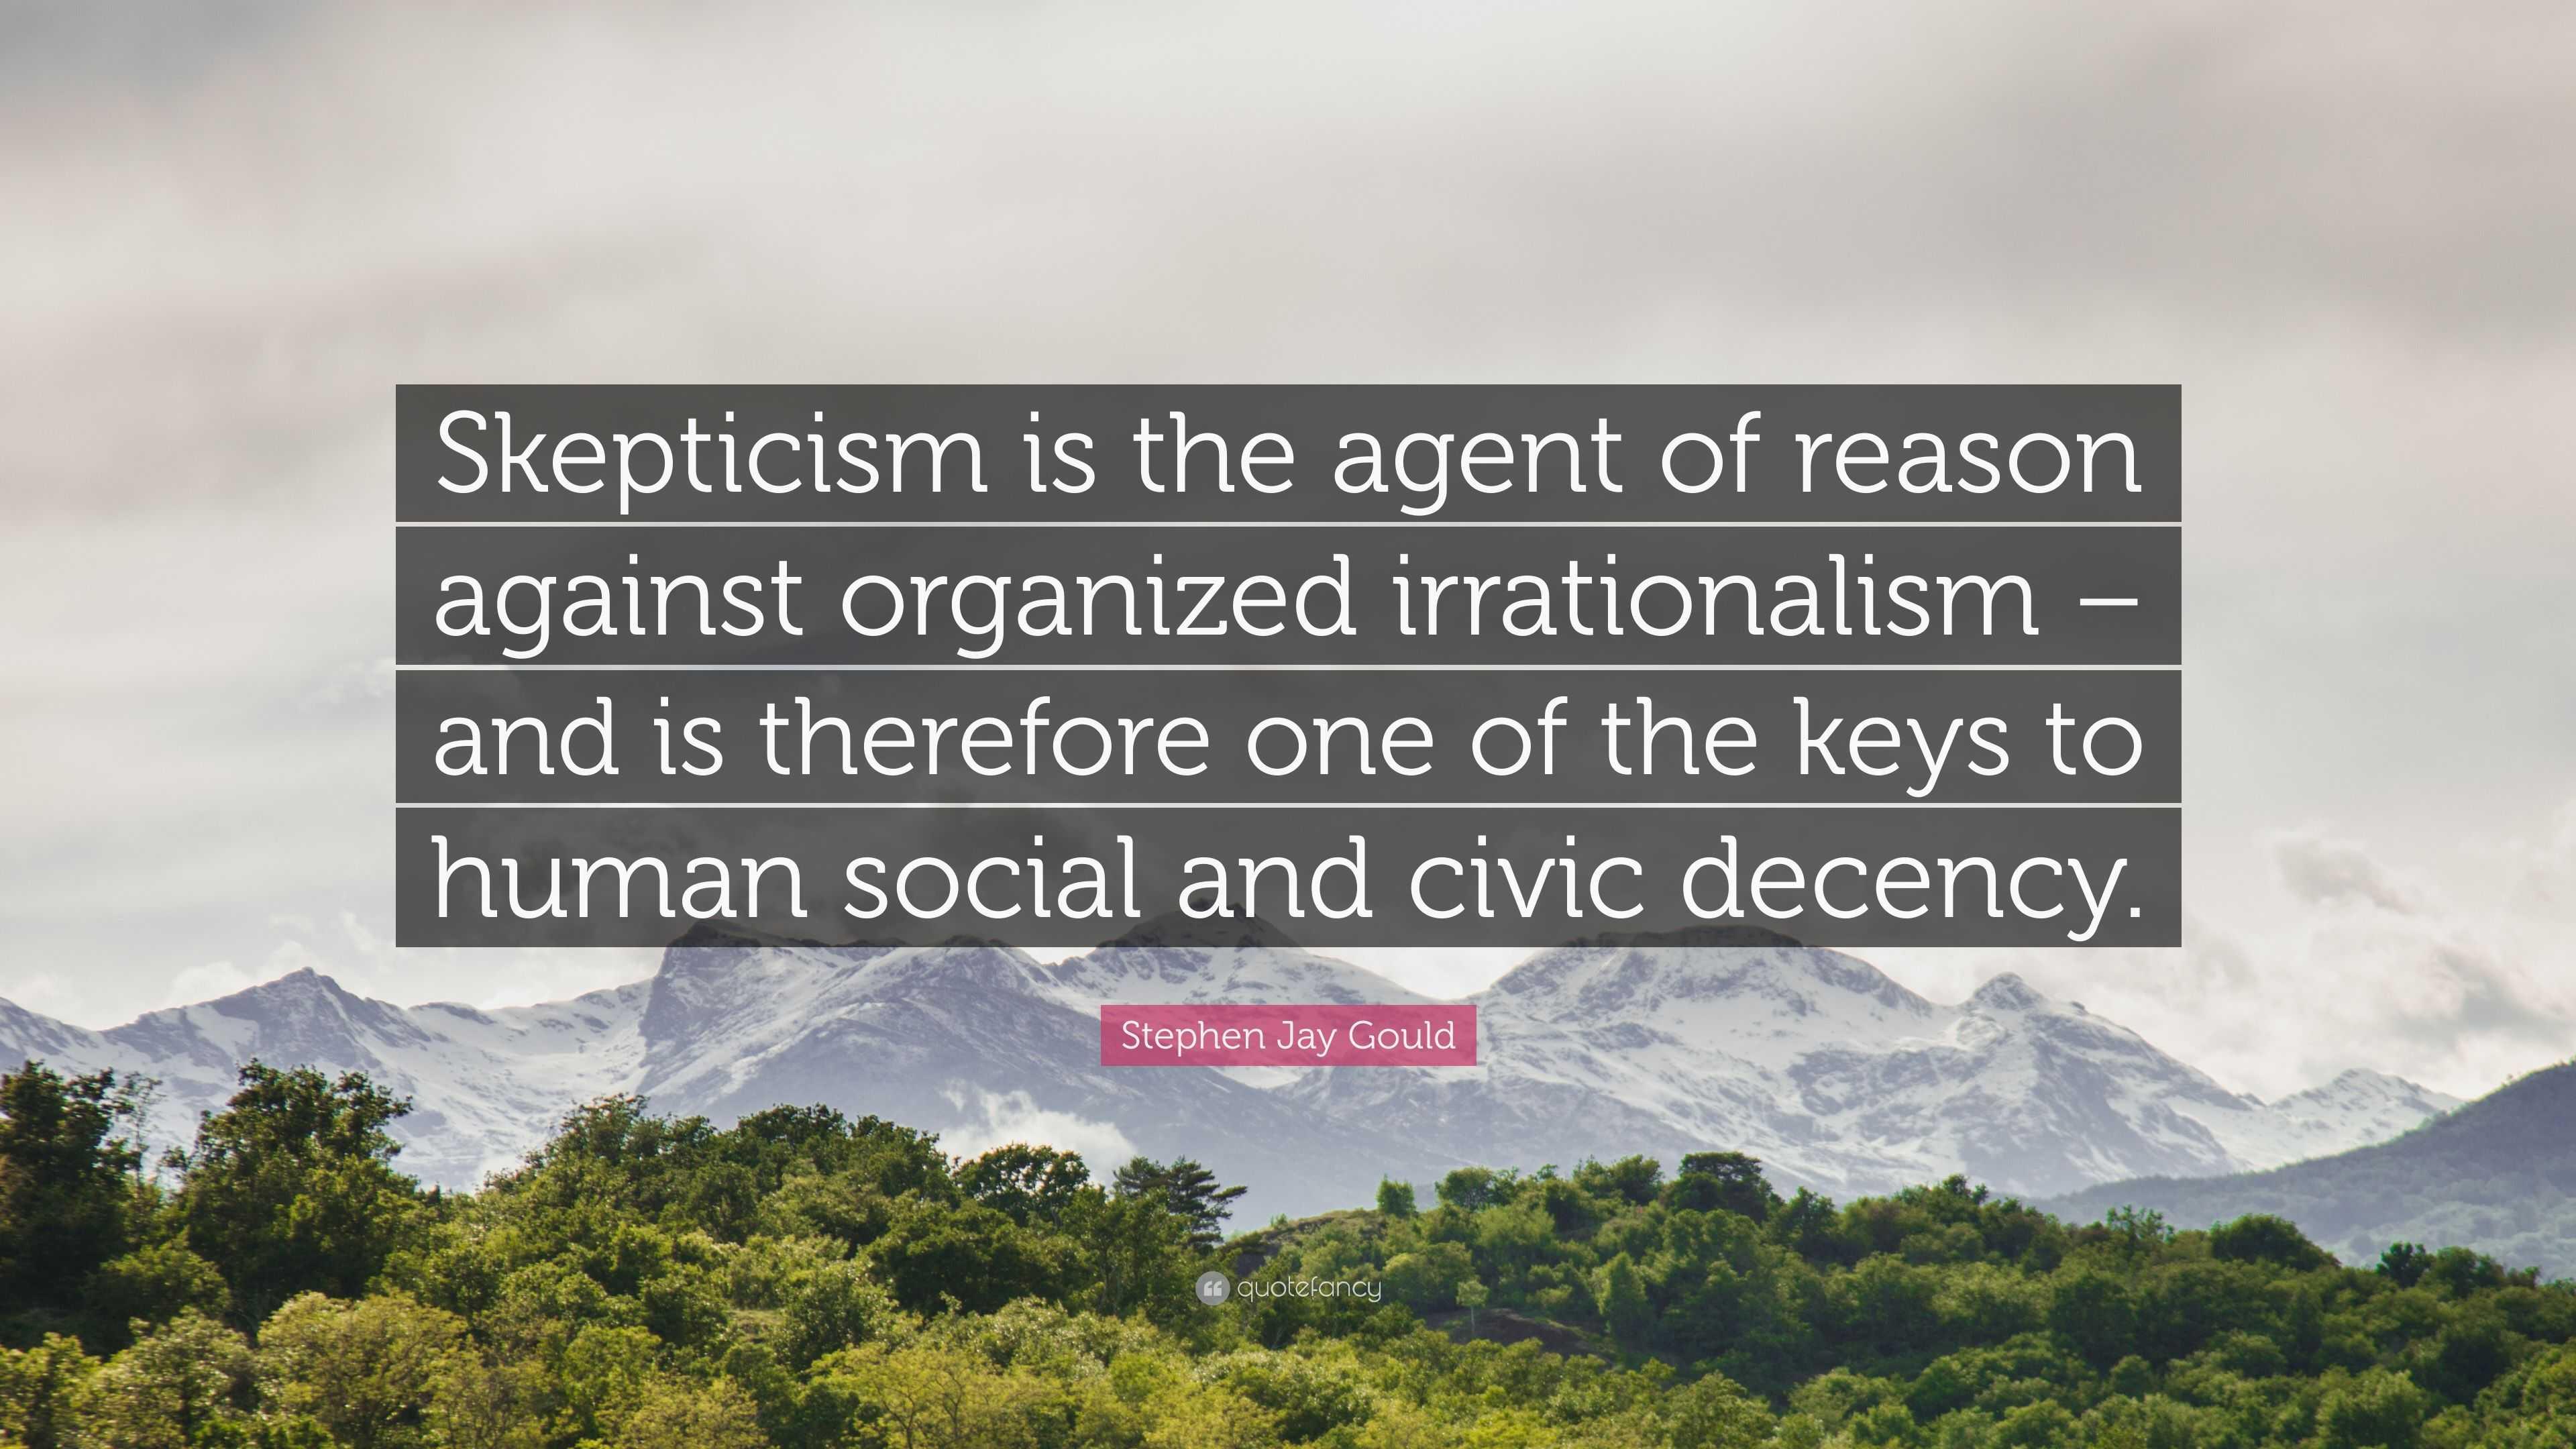 Organized Skepticism